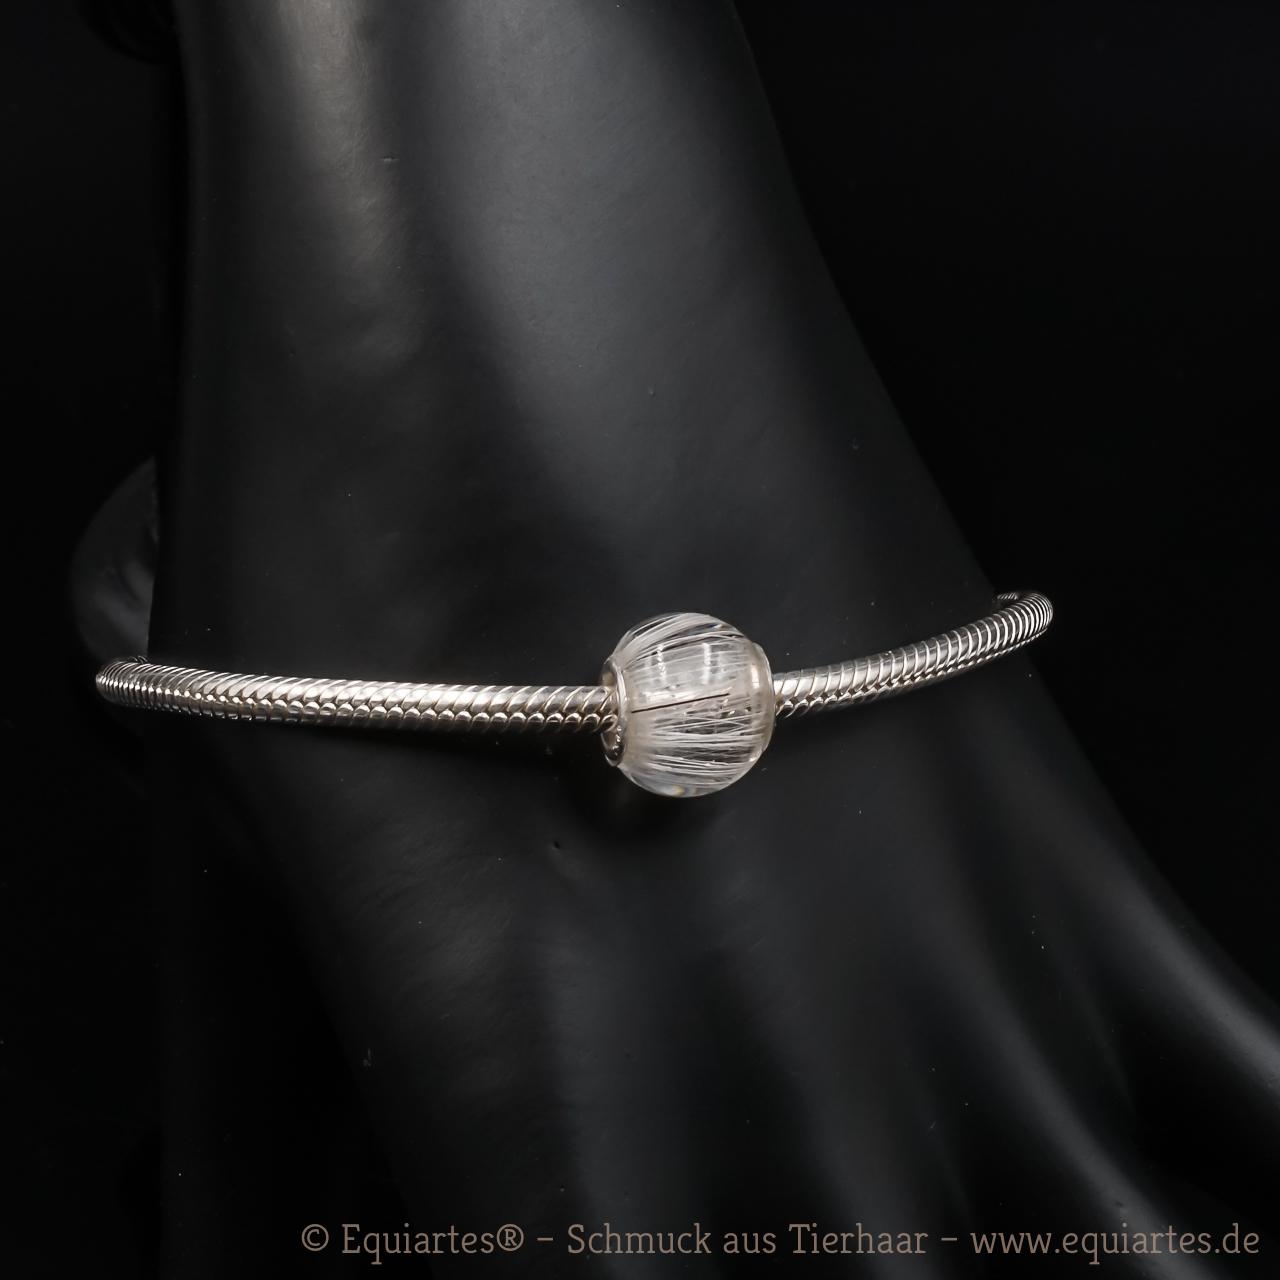 Tierhaarschmuck - Schlangenarmband Serpens - Sterlingsilber